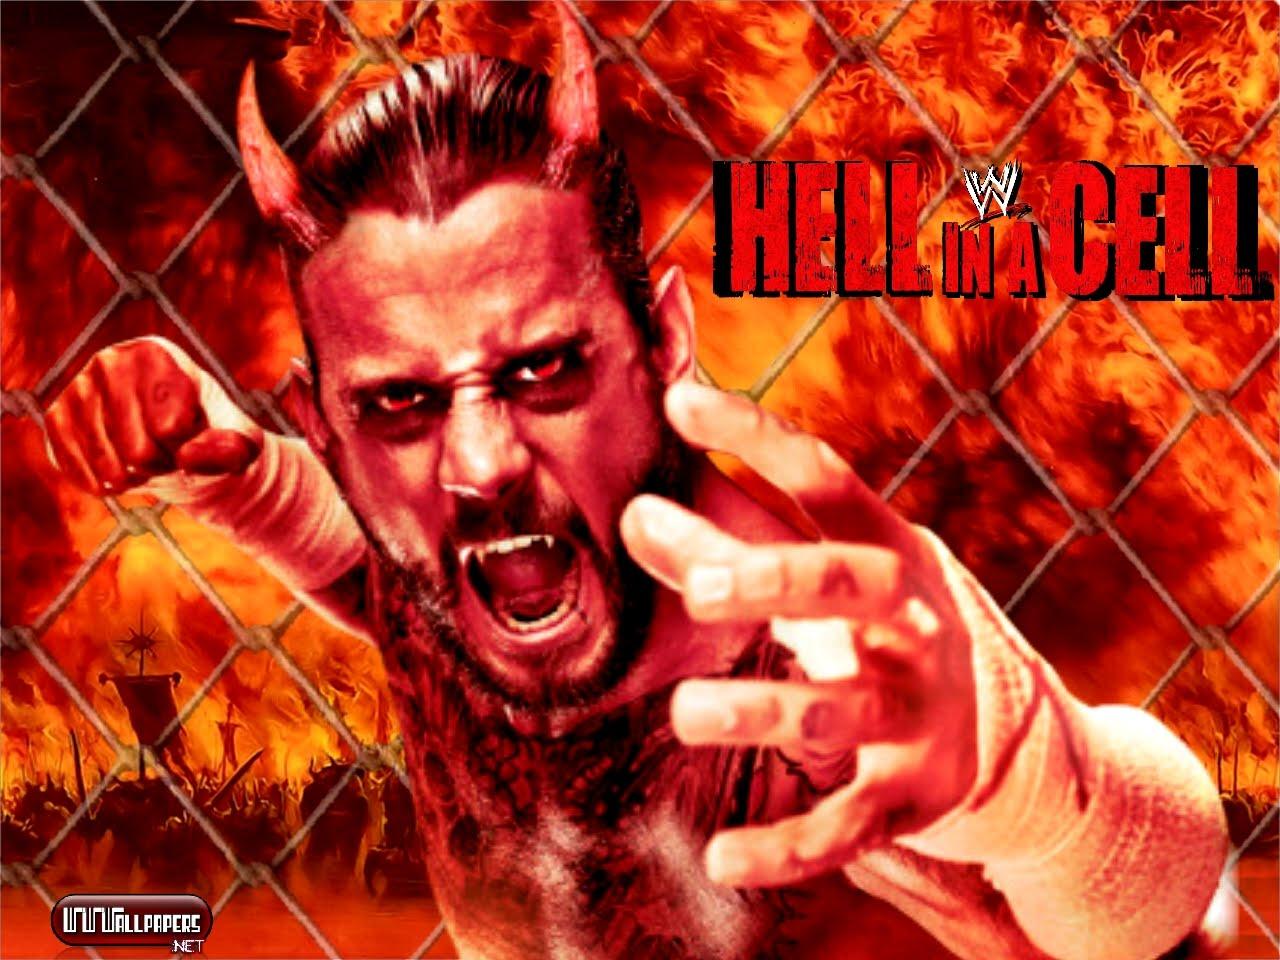 http://3.bp.blogspot.com/-B9F4rNfPnfU/UFicdUjOcBI/AAAAAAAACrY/cPucm0sECug/s1600/Hell++in+a+Cell+wwe+cm+punk+poster+2012.jpg